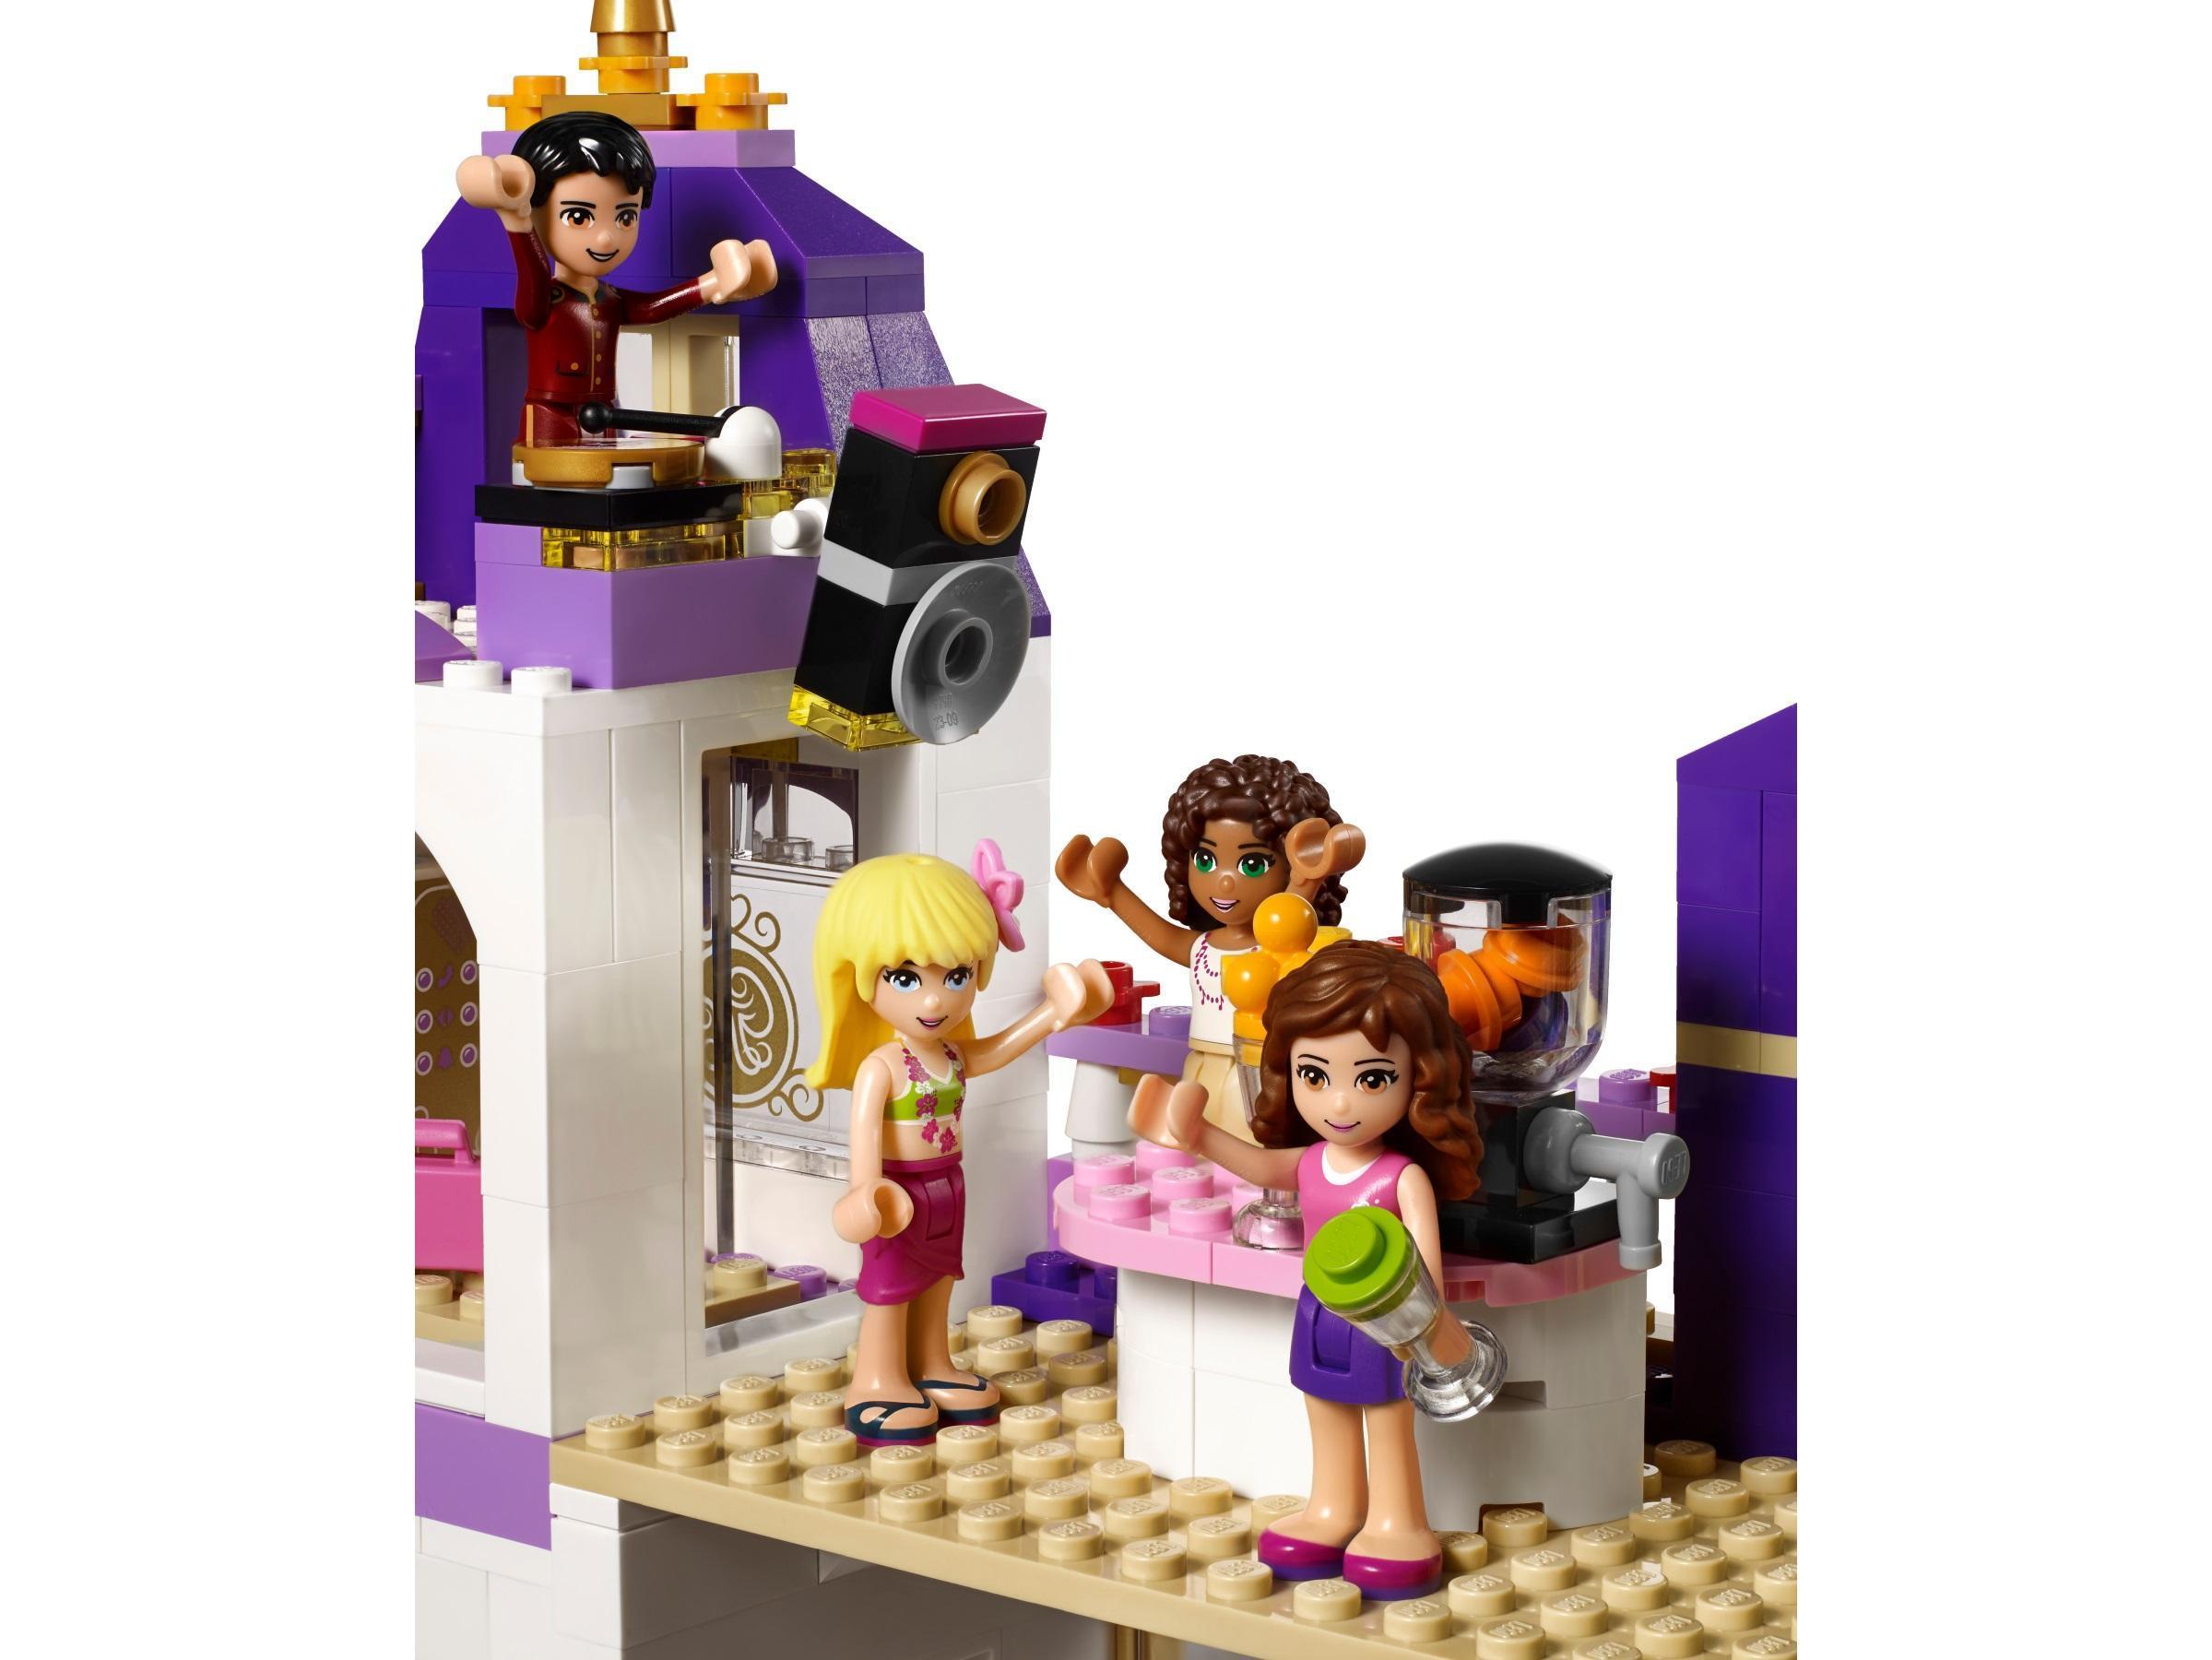 lego 41101 friends heartlake grand hotel toys games. Black Bedroom Furniture Sets. Home Design Ideas